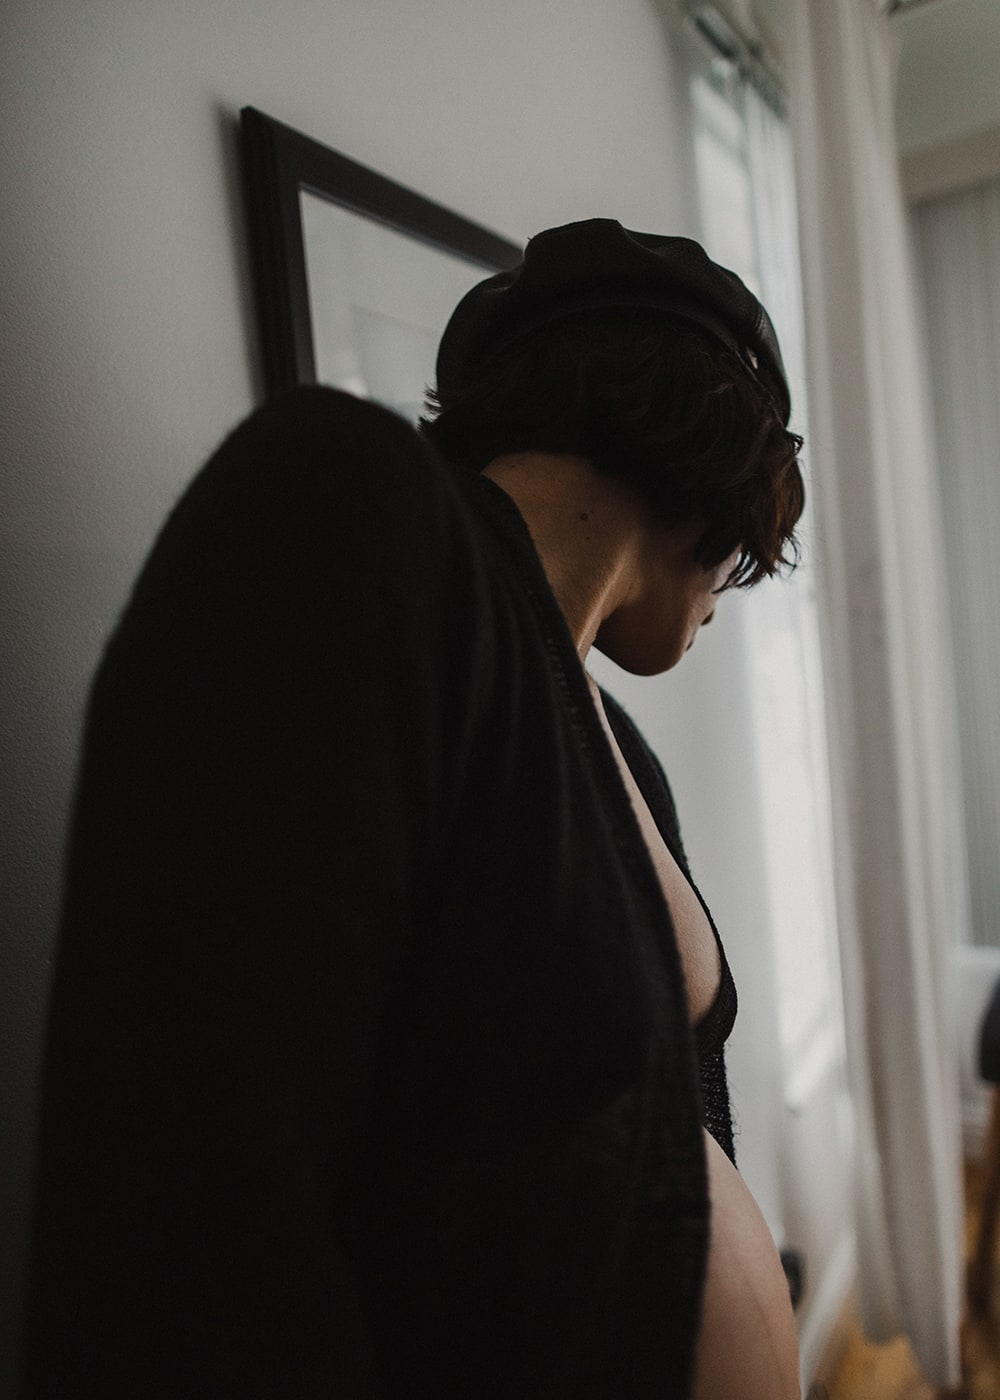 woman wearing hat looking down at window